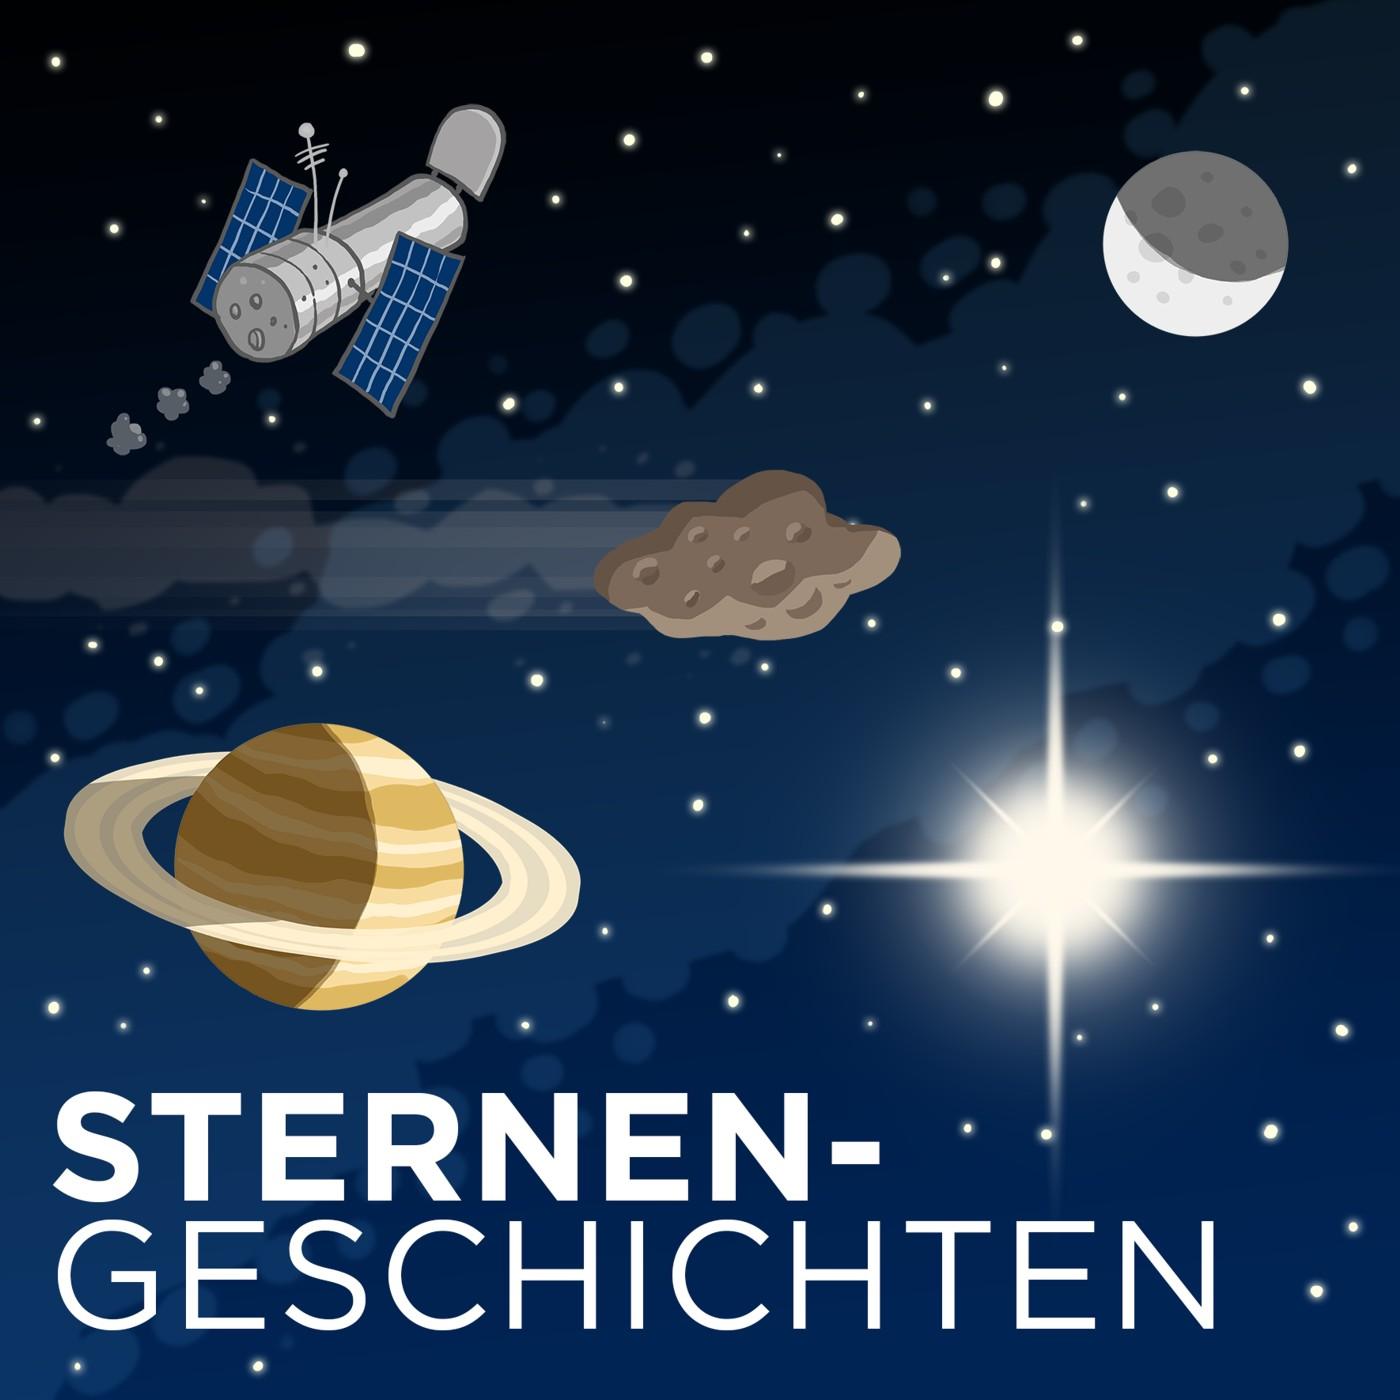 Sternengeschichten Folge 362: Das Spitzer-Weltraumteleskop